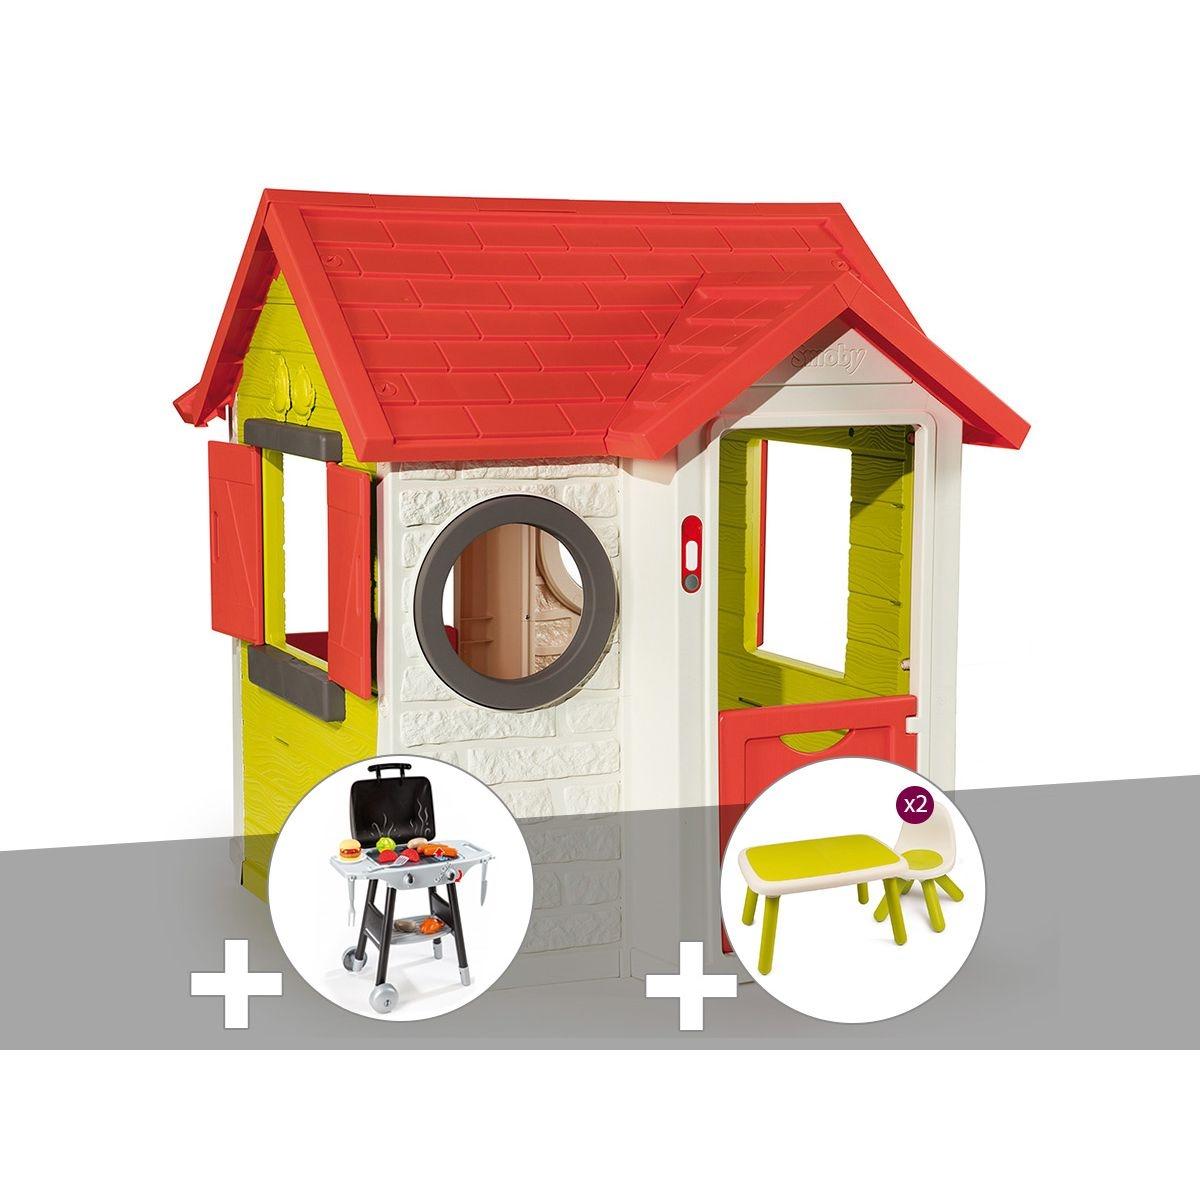 Cabane enfant My House - Smoby + Plancha + Table et 2 chaises